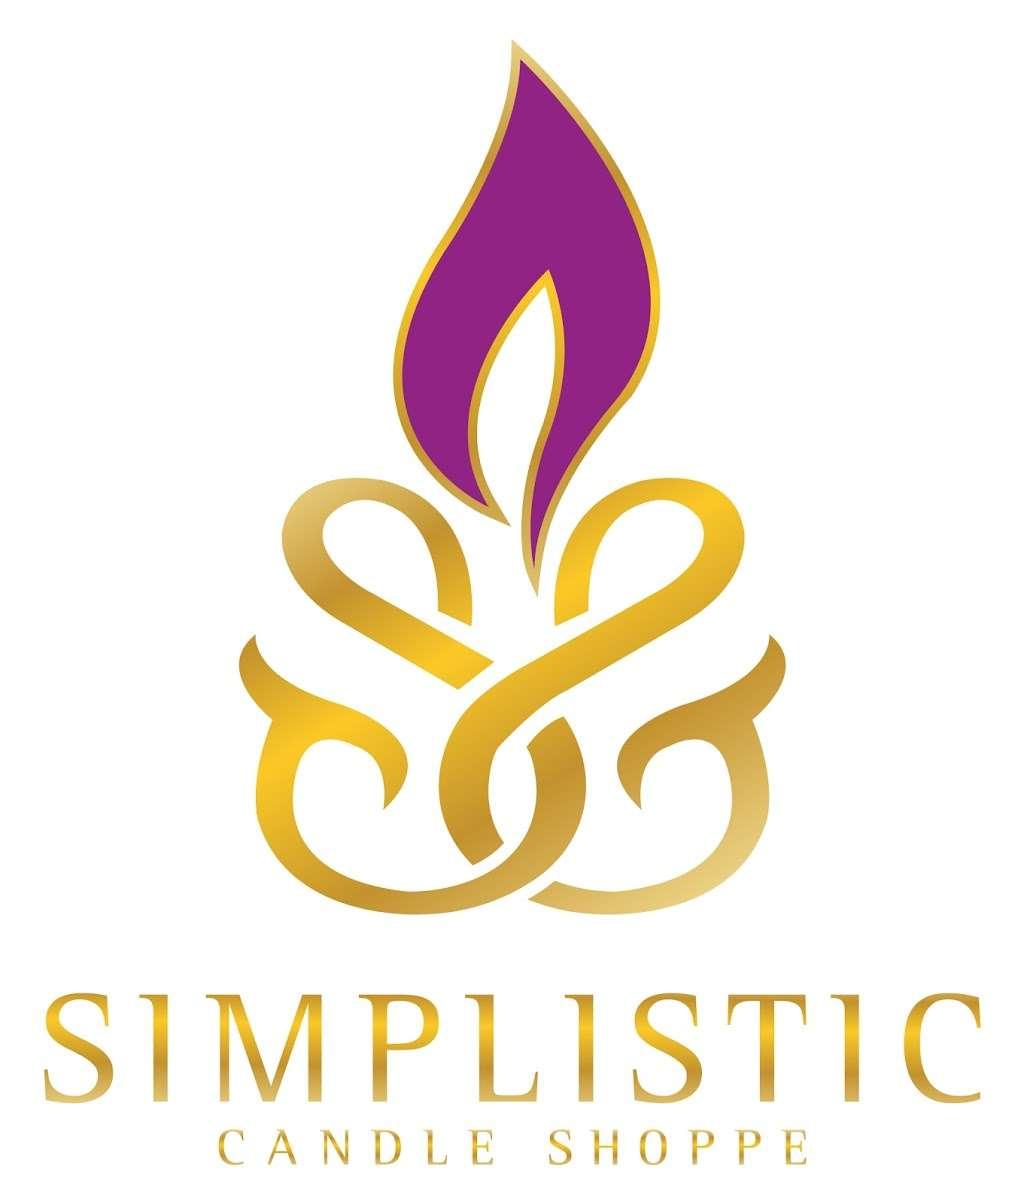 Simplistic Candle Shoppe - home goods store  | Photo 2 of 3 | Address: 39252 Winchester Rd Ste 107 #272, Murrieta, CA 92563, USA